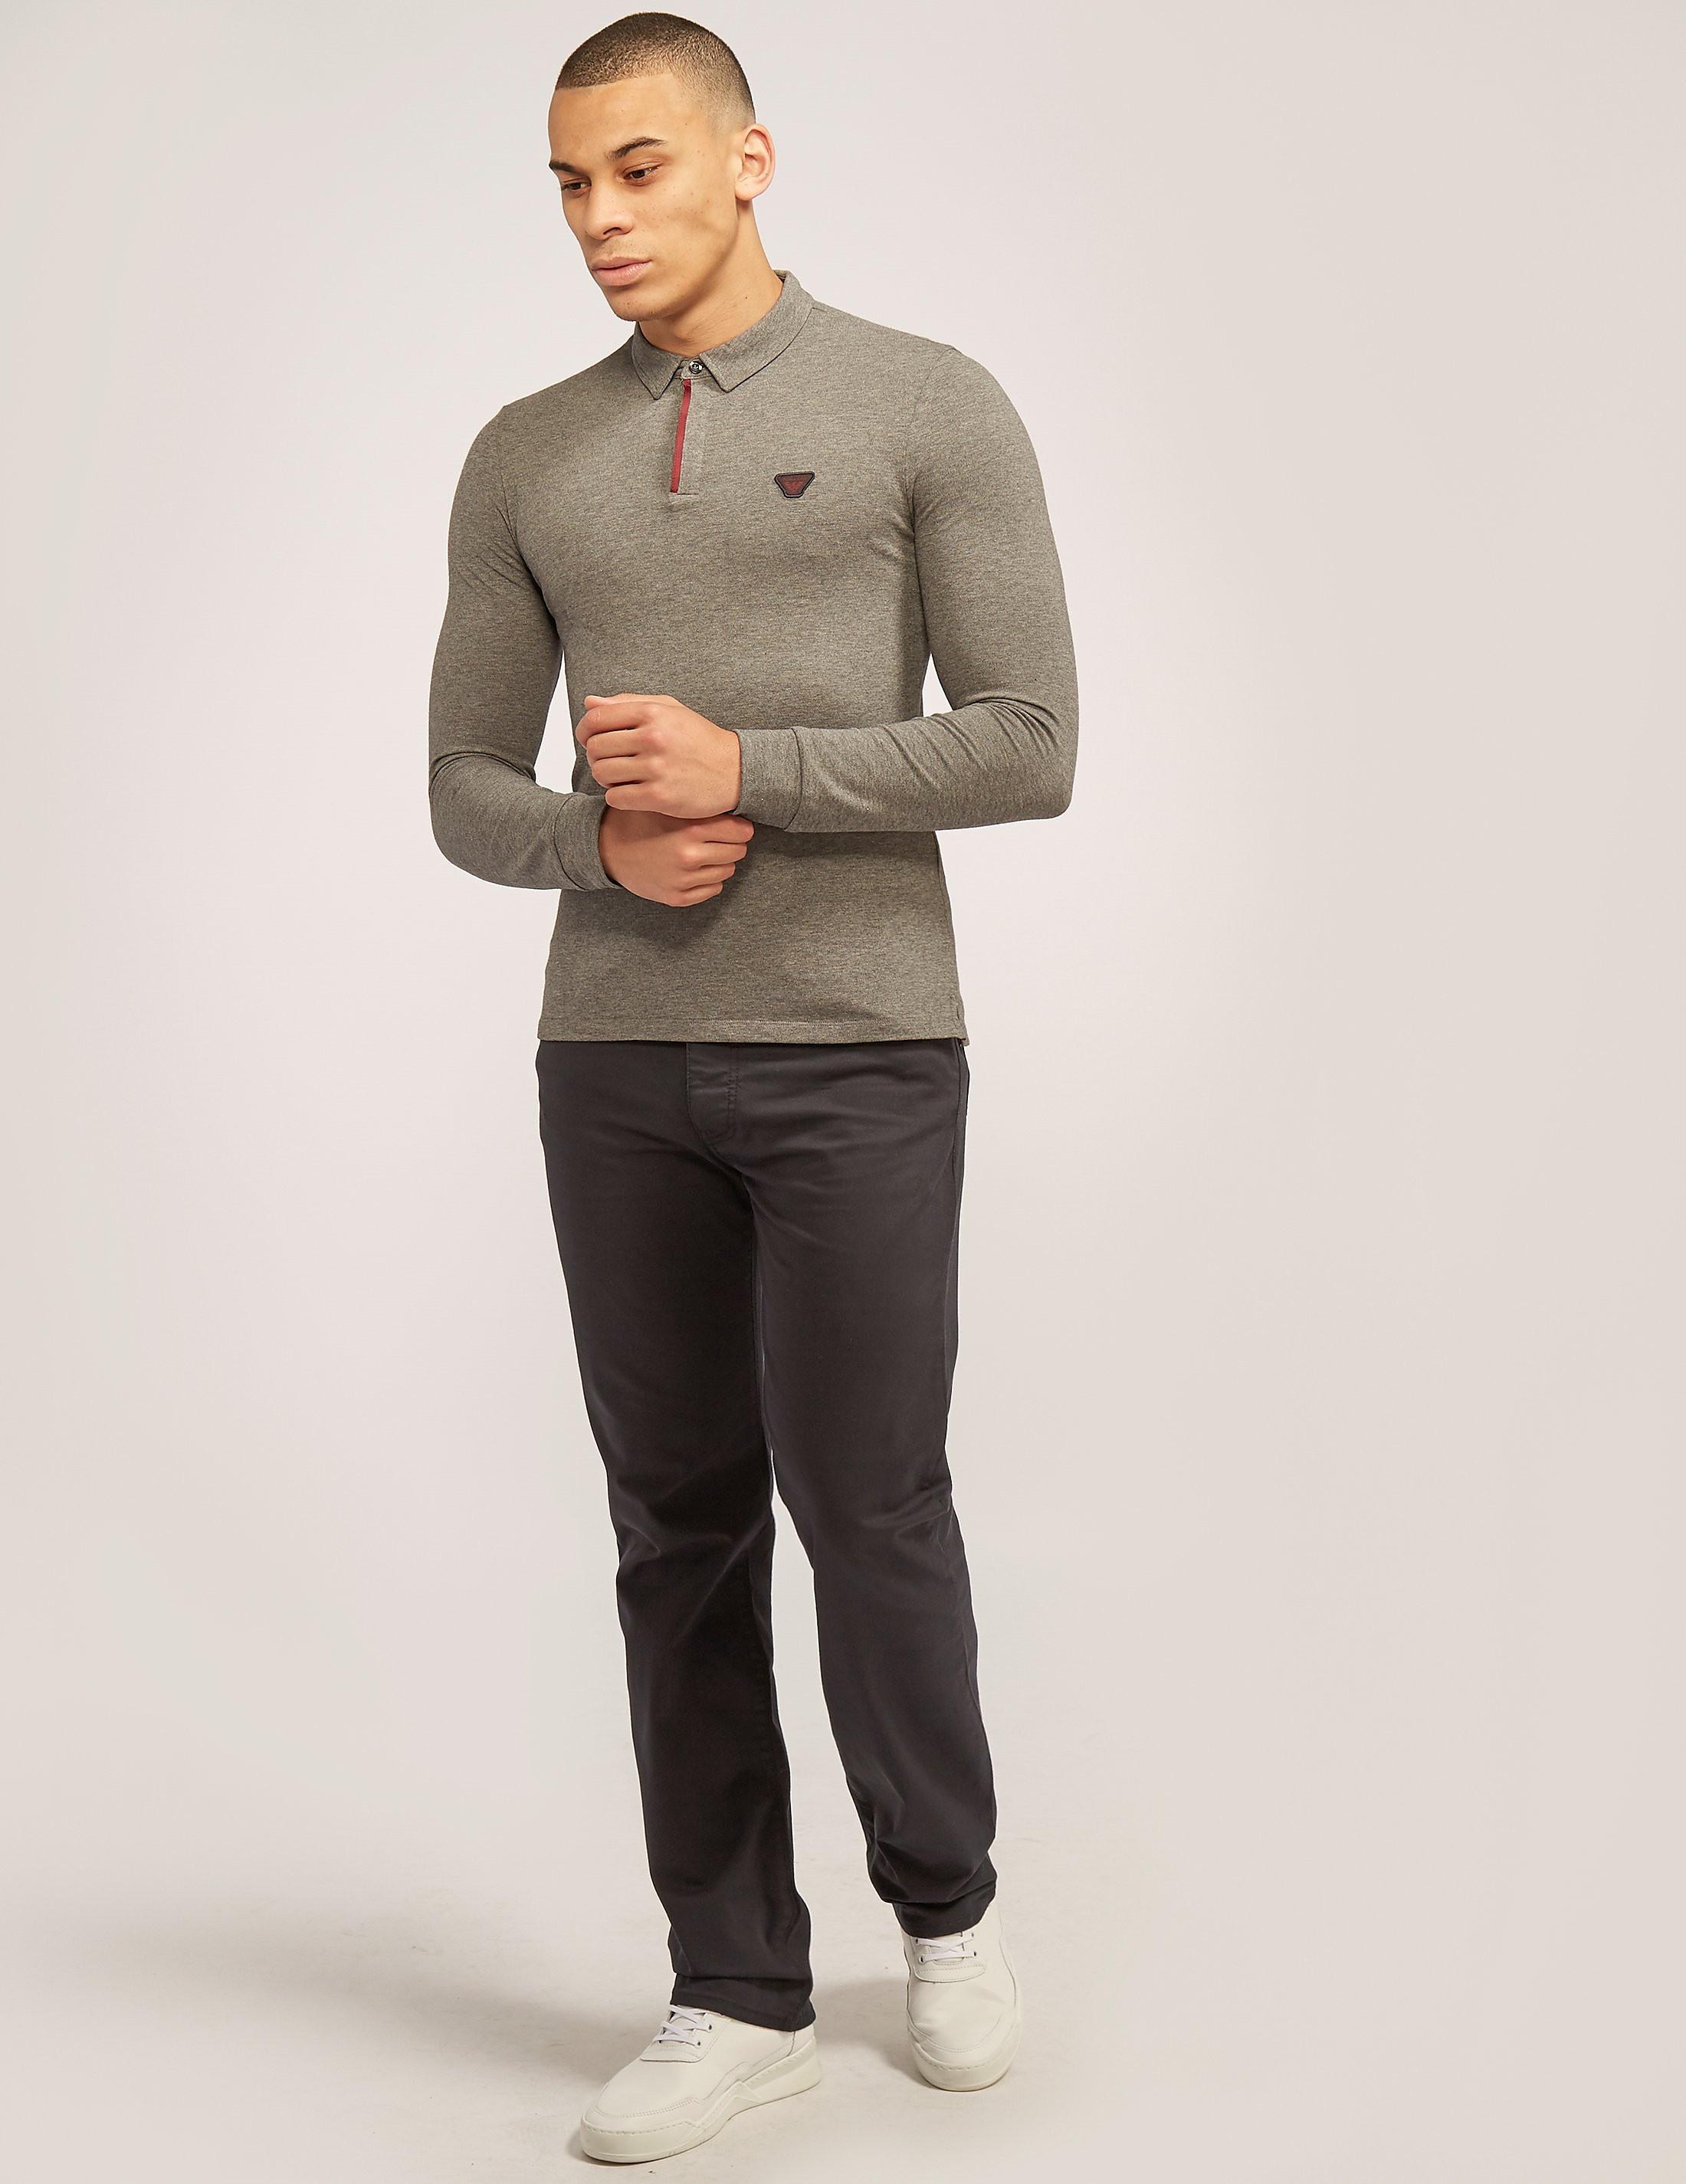 Armani Jeans J21 Comfort Fit Gaberdine Jean - Long Length